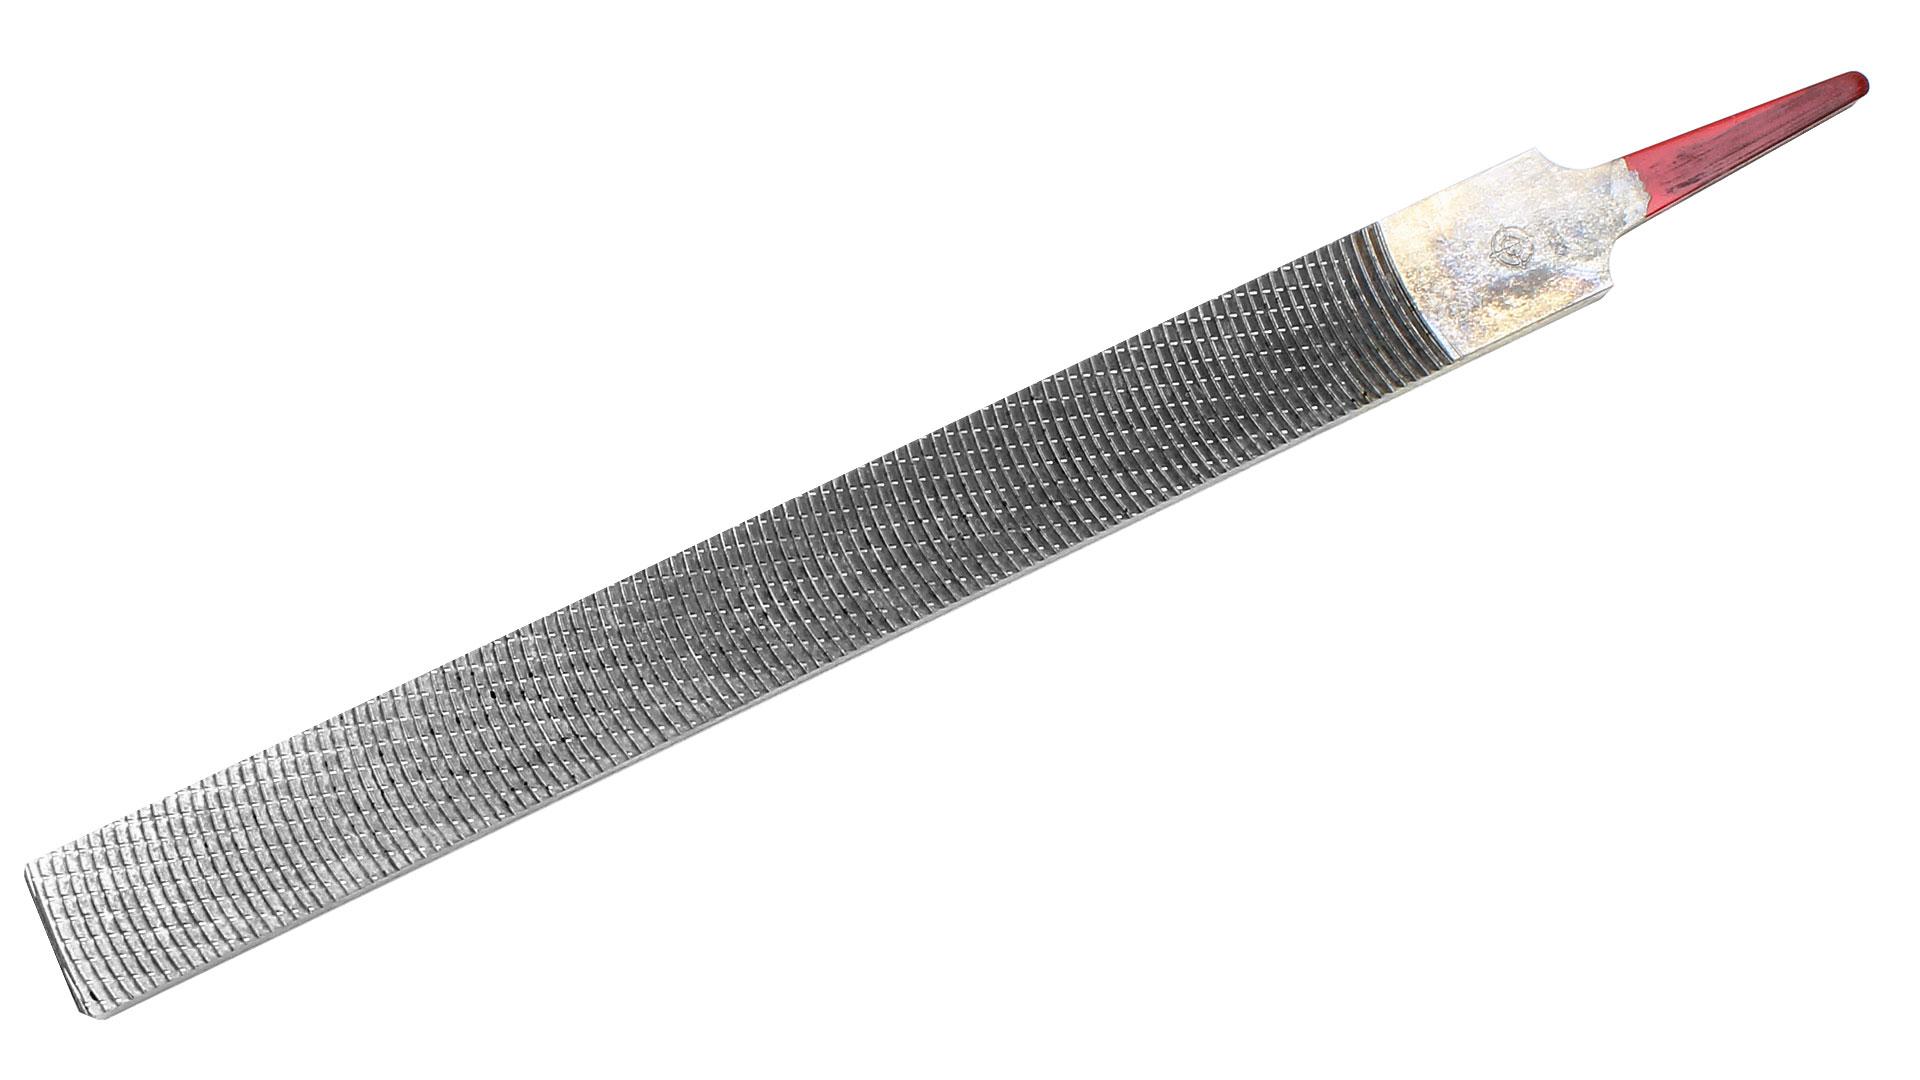 Chemical Polished HALF ROUND Mini Razor File 100mm Rasp NEW Made in Japan